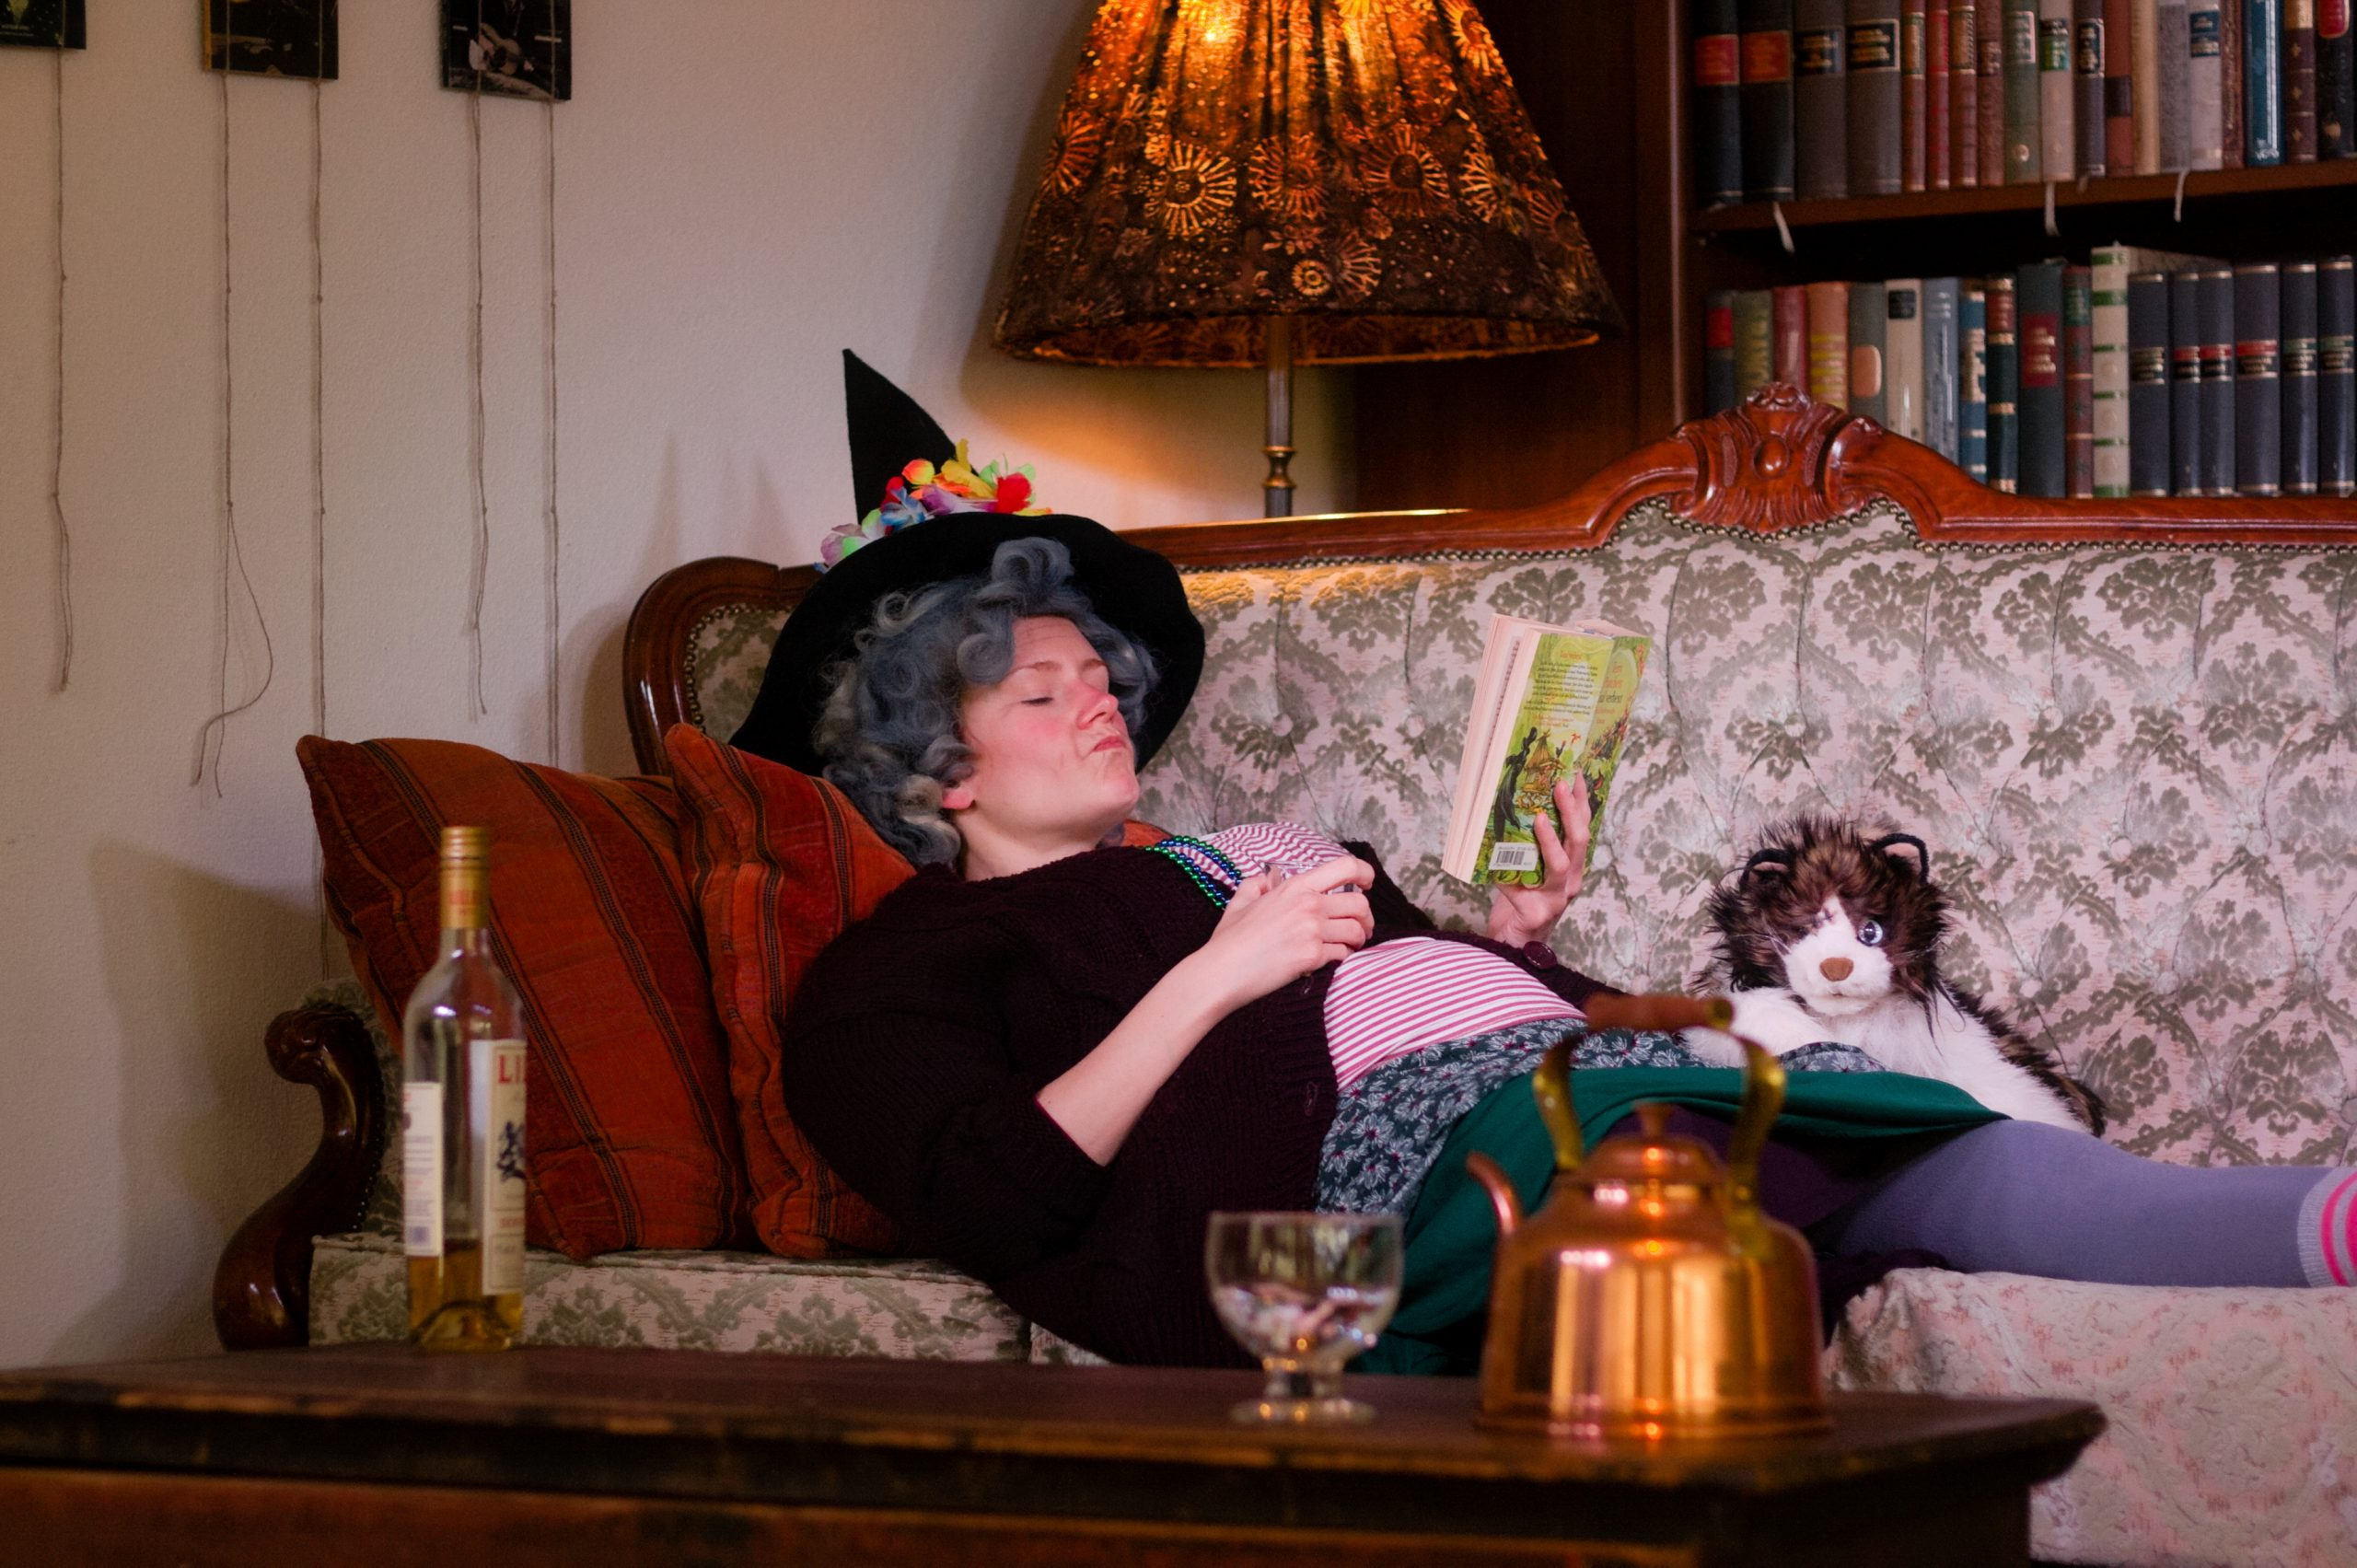 Nanny Ogg auf dem Sofa